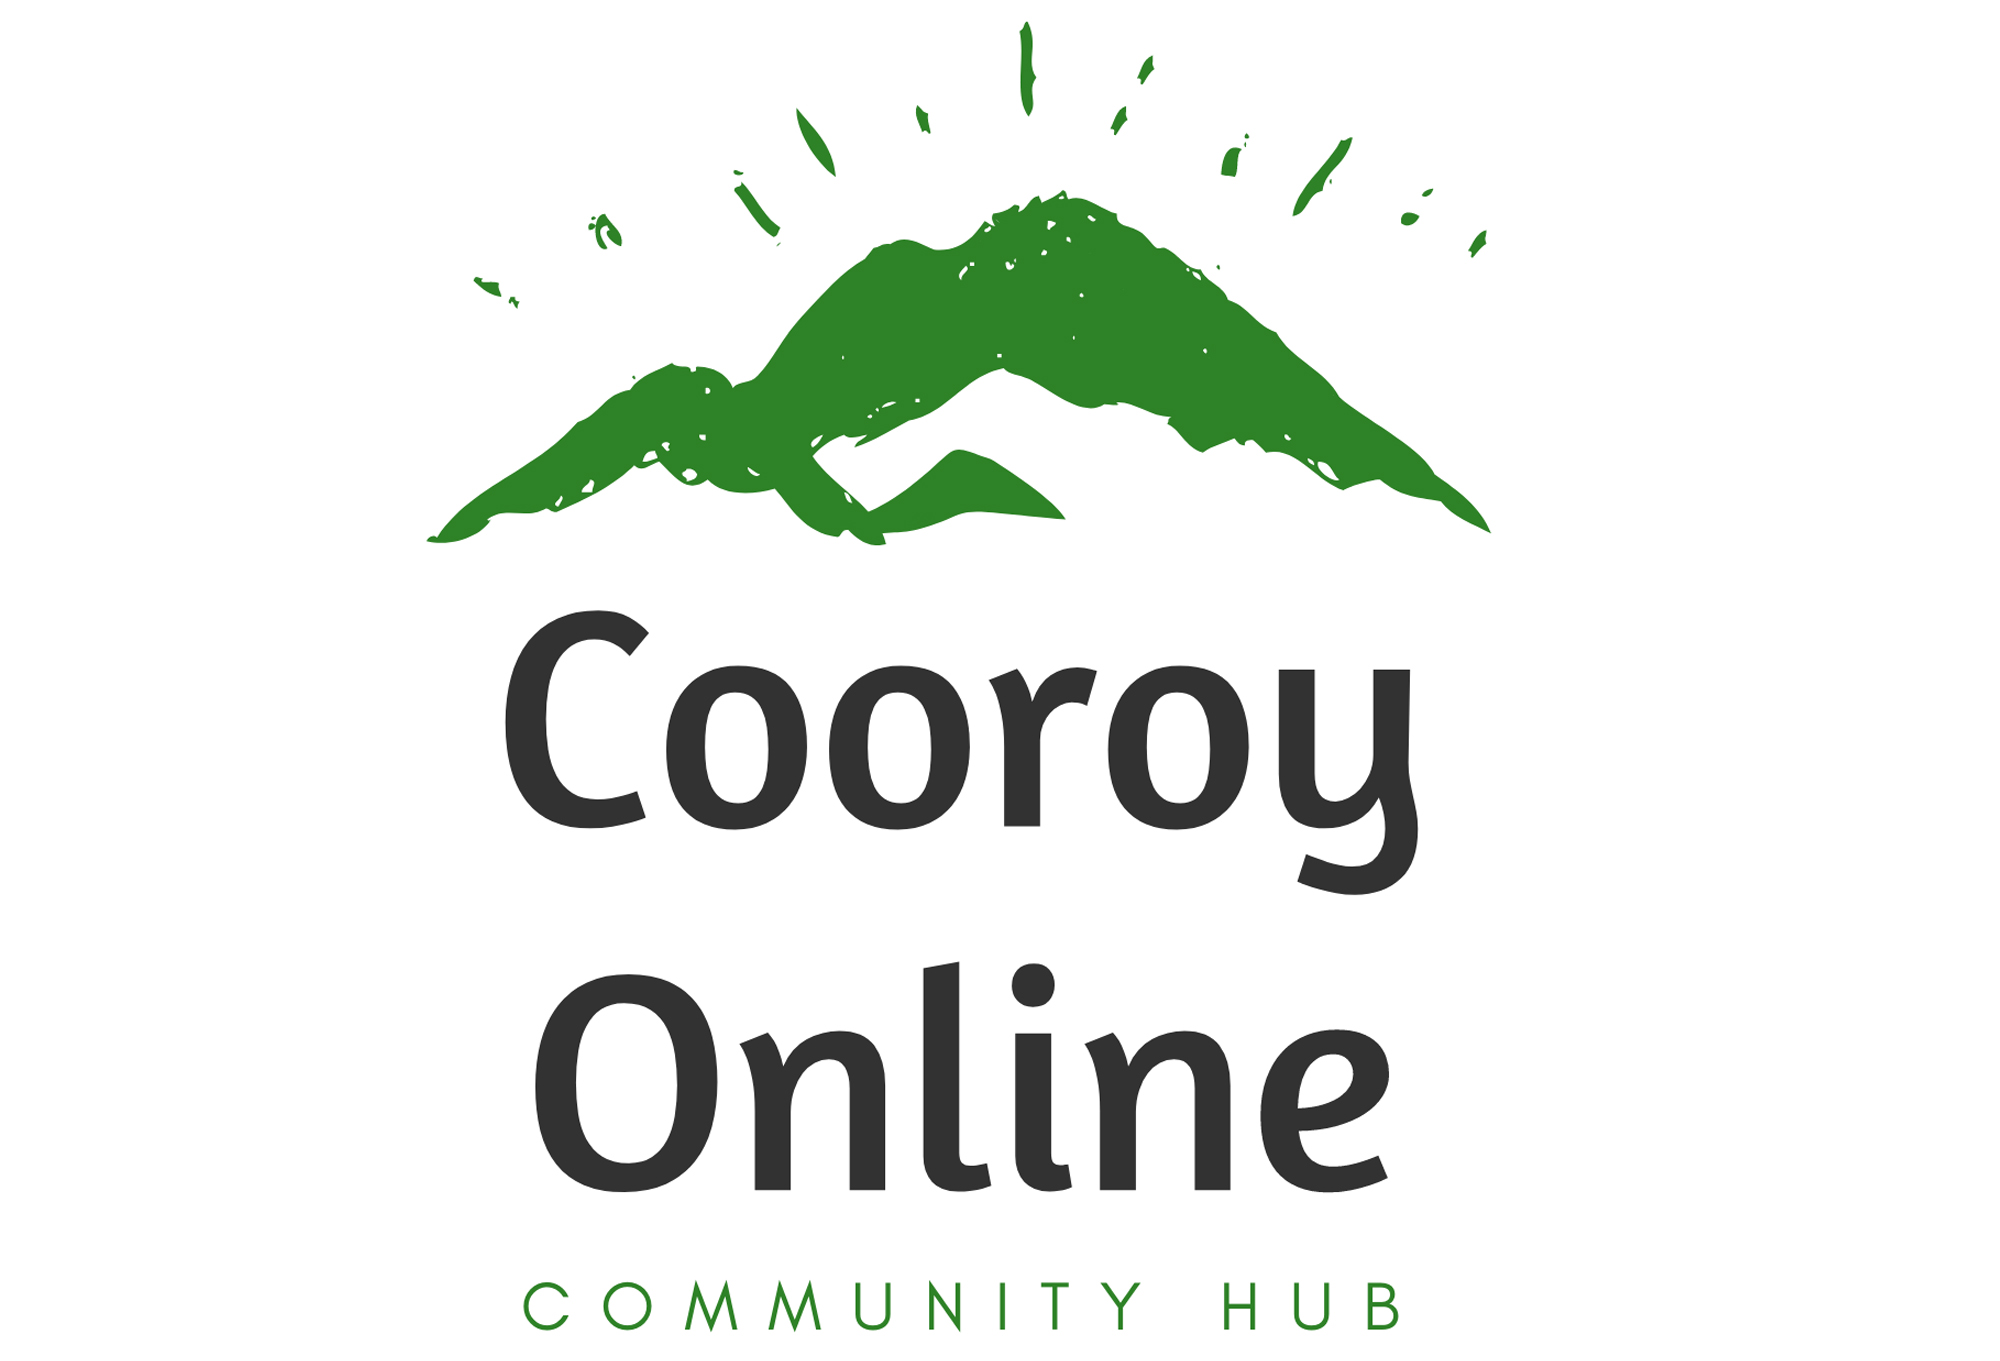 Cooroy Online